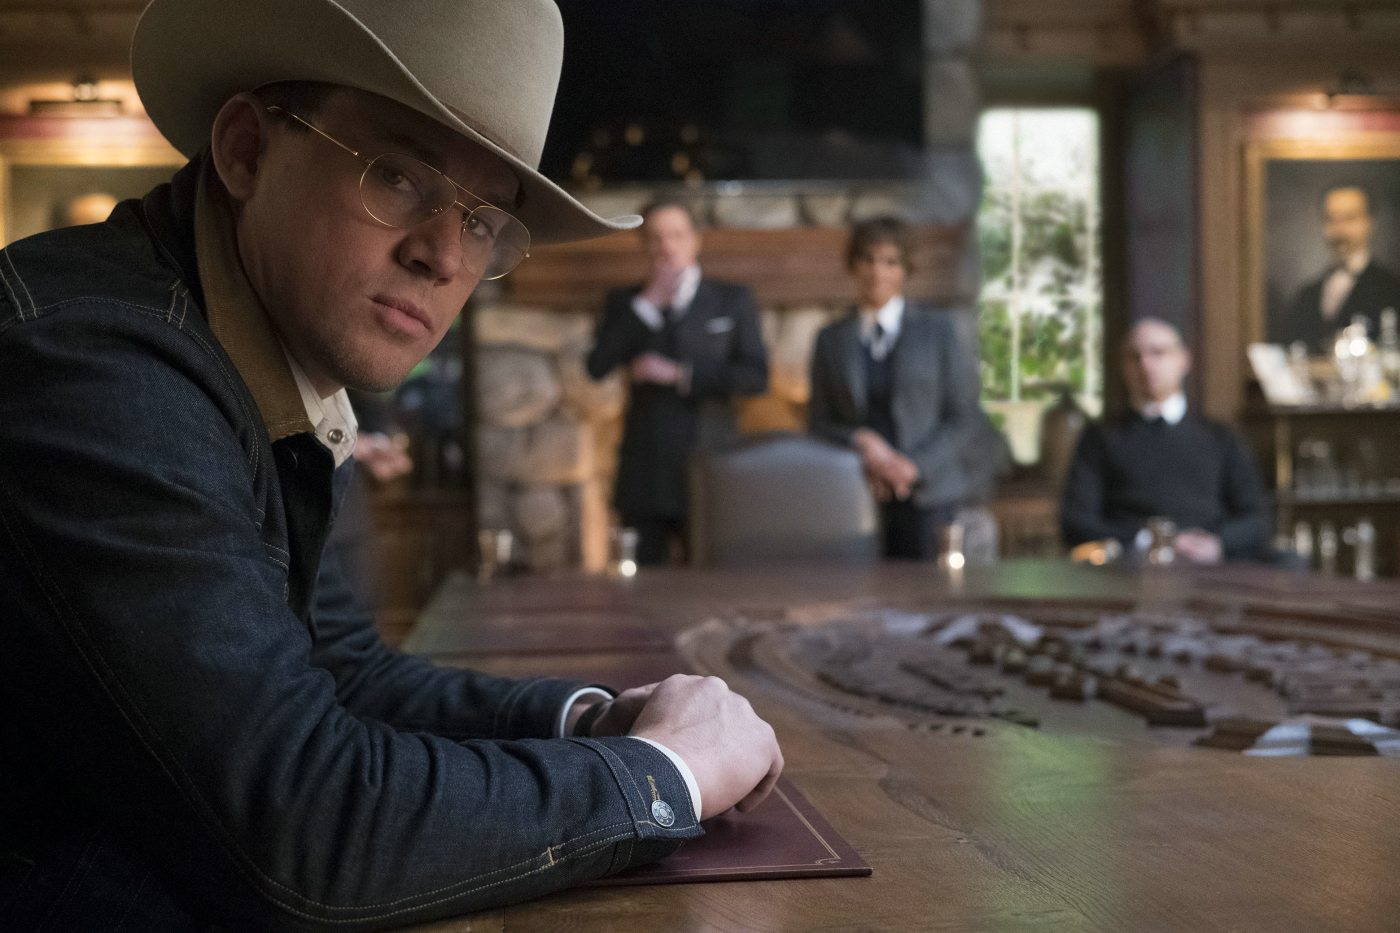 Kingsman 2 The Golden Circle 20th Century Fox Taron Egerton Colin Firth Julianne Moore Review Kritik Film 2